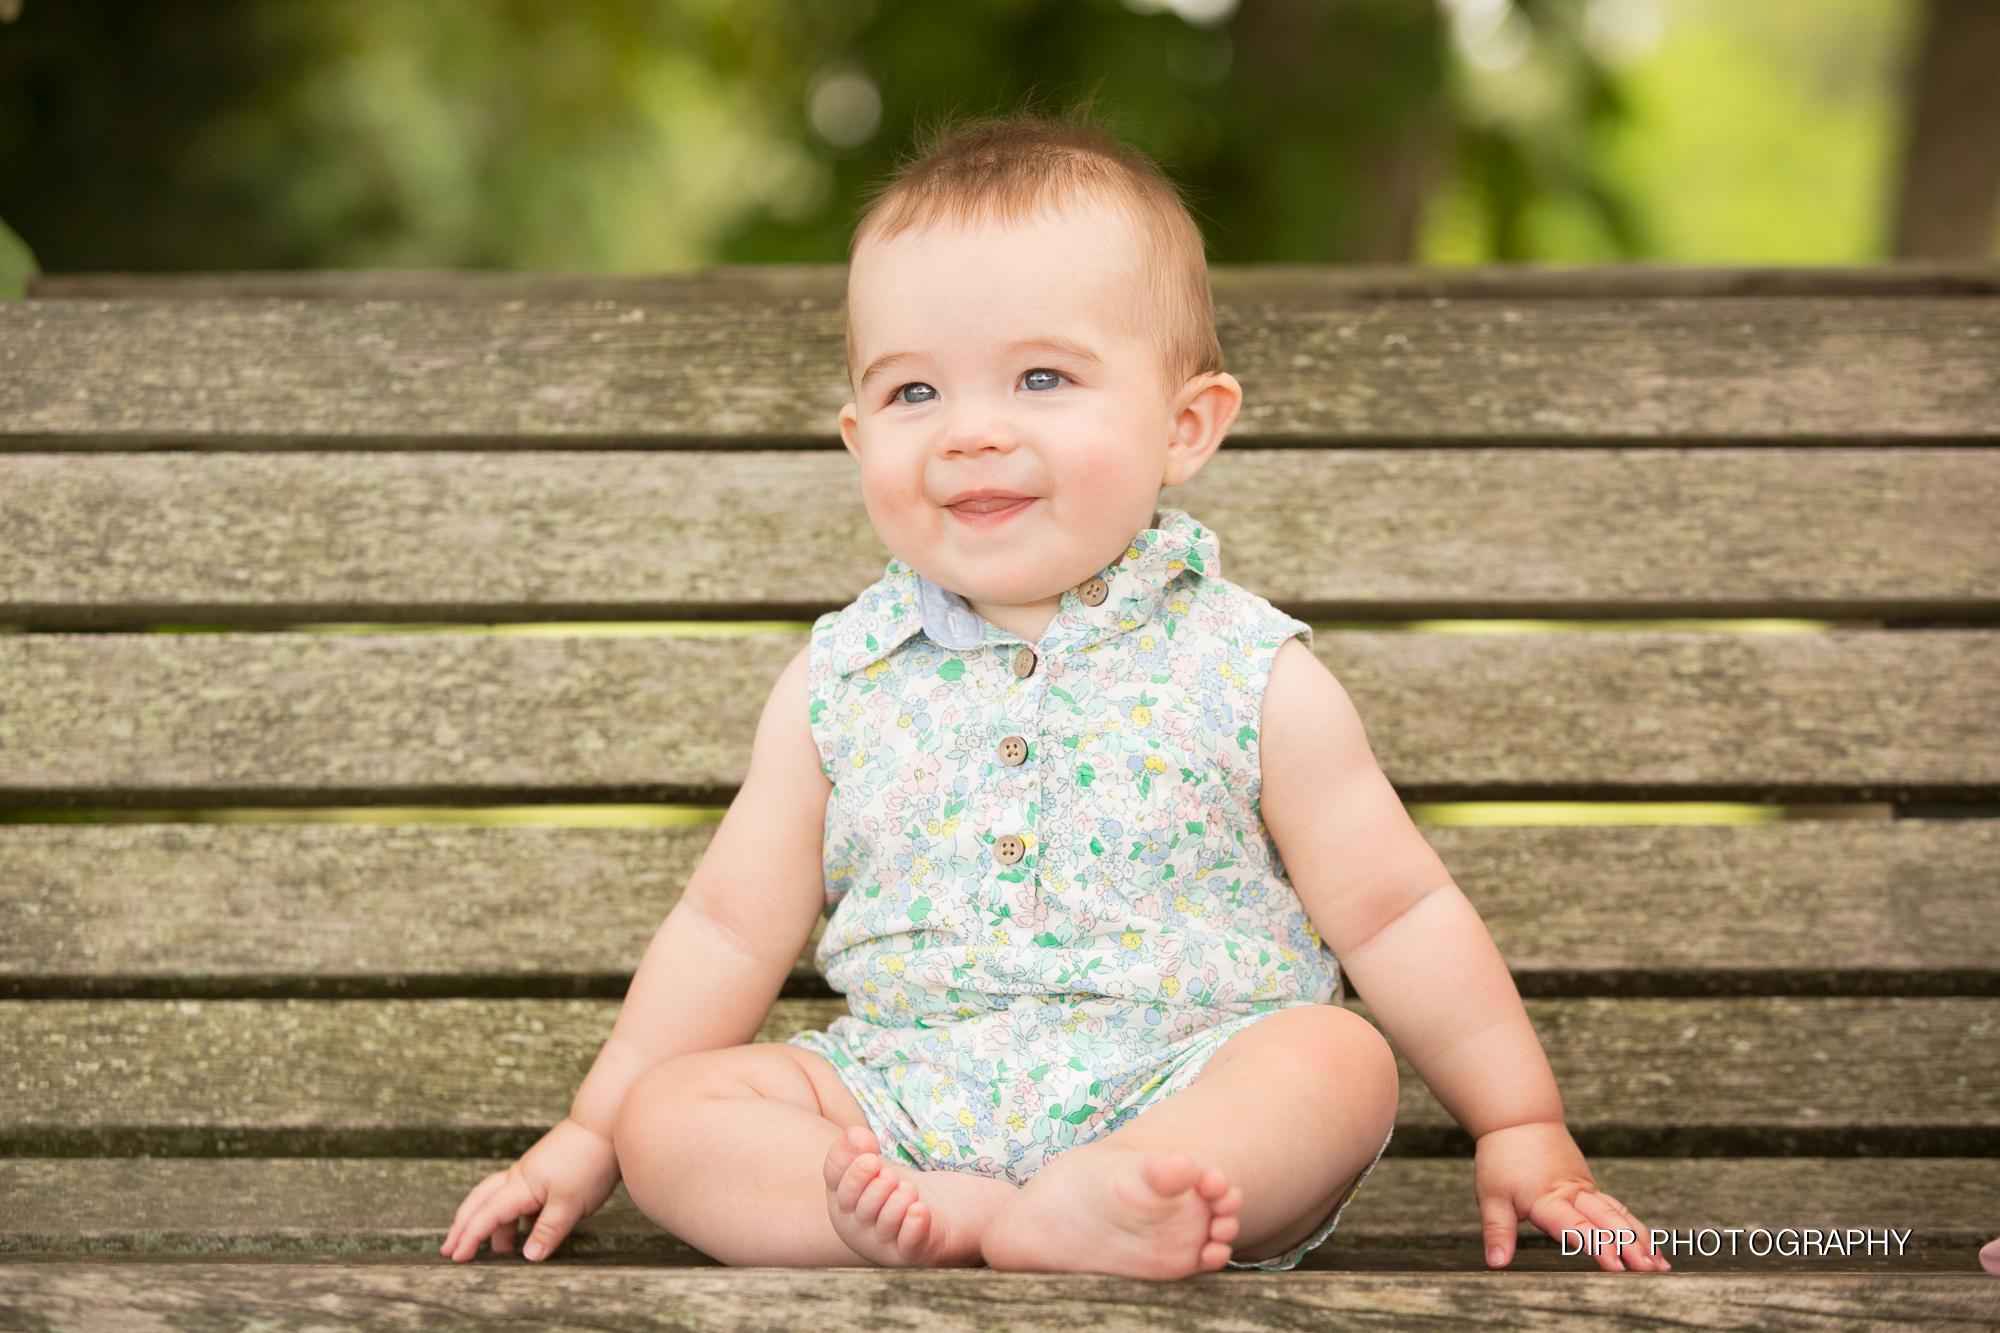 Dipp_2016 Gabrielle's 6 Months-623-Edit